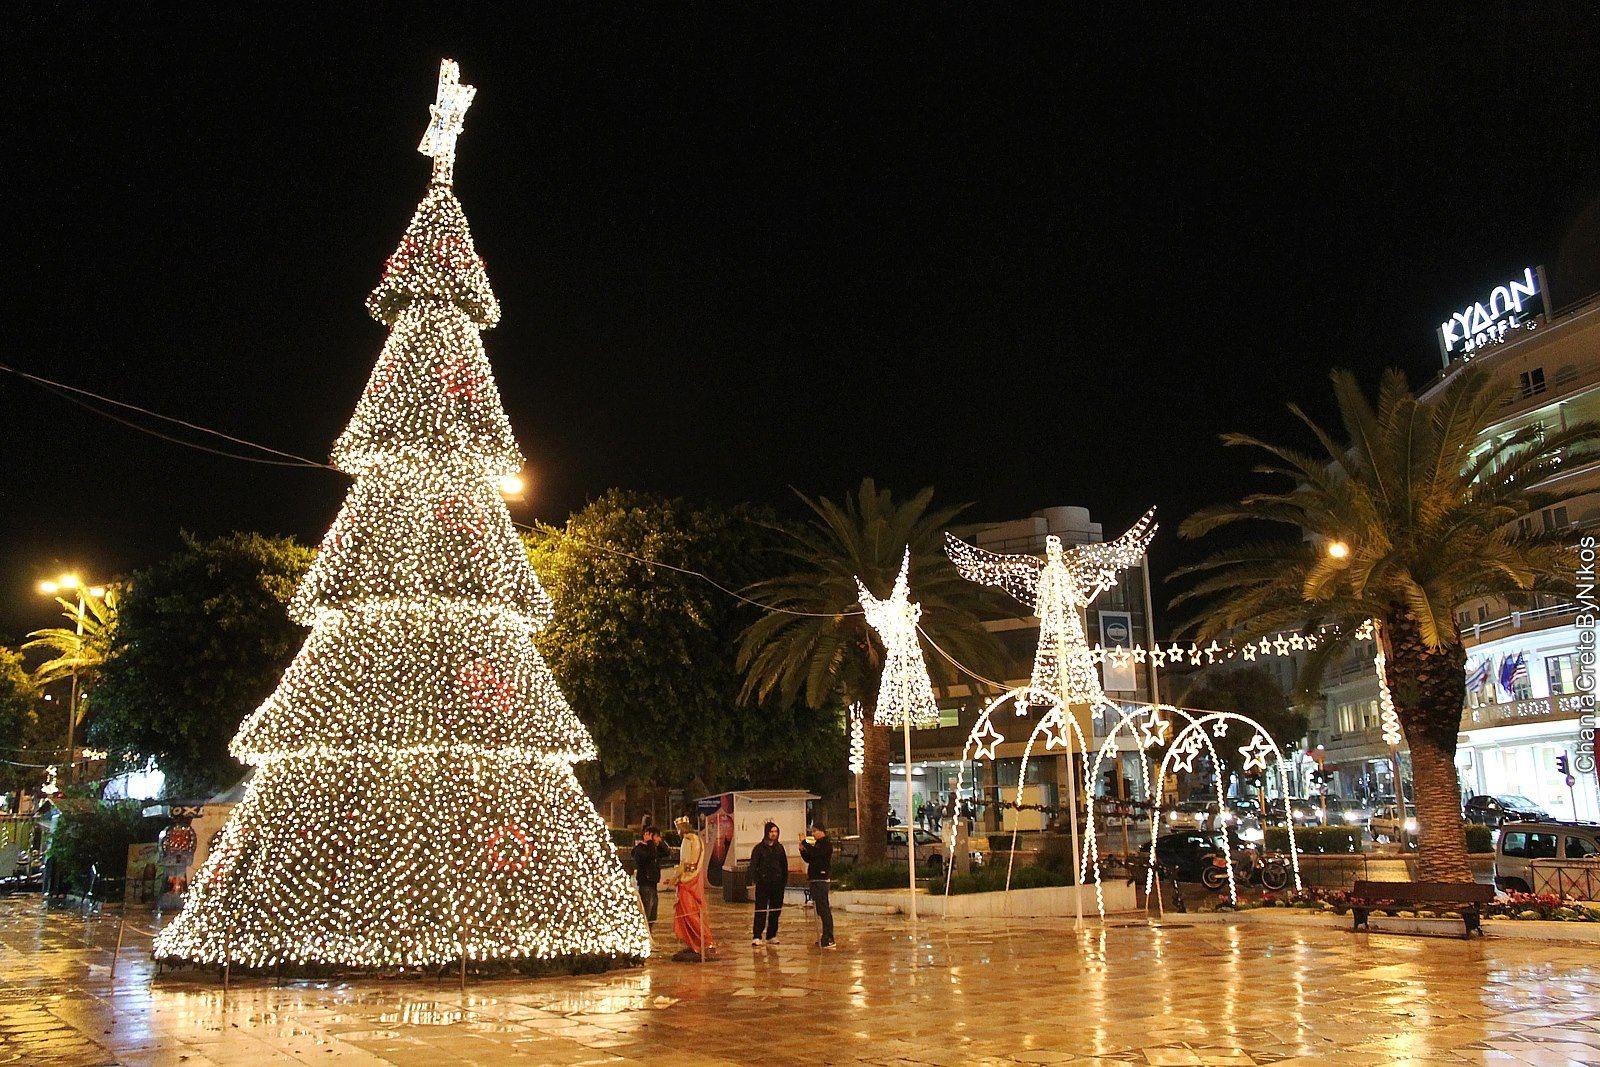 Christmas at Chania, Crete, Greece | Greece, Crete, Beautiful places